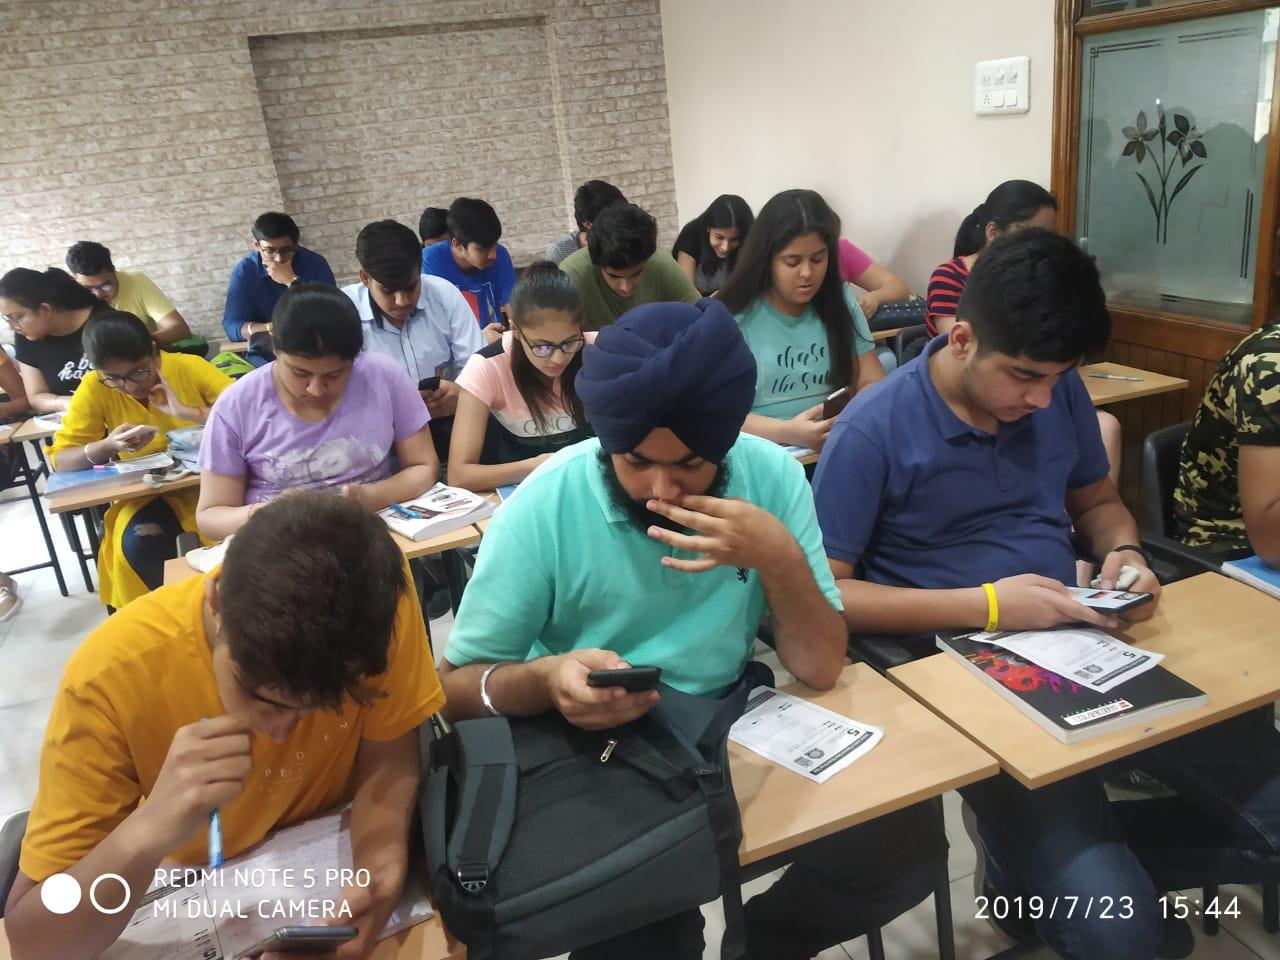 abhishek institute (1).jpeg